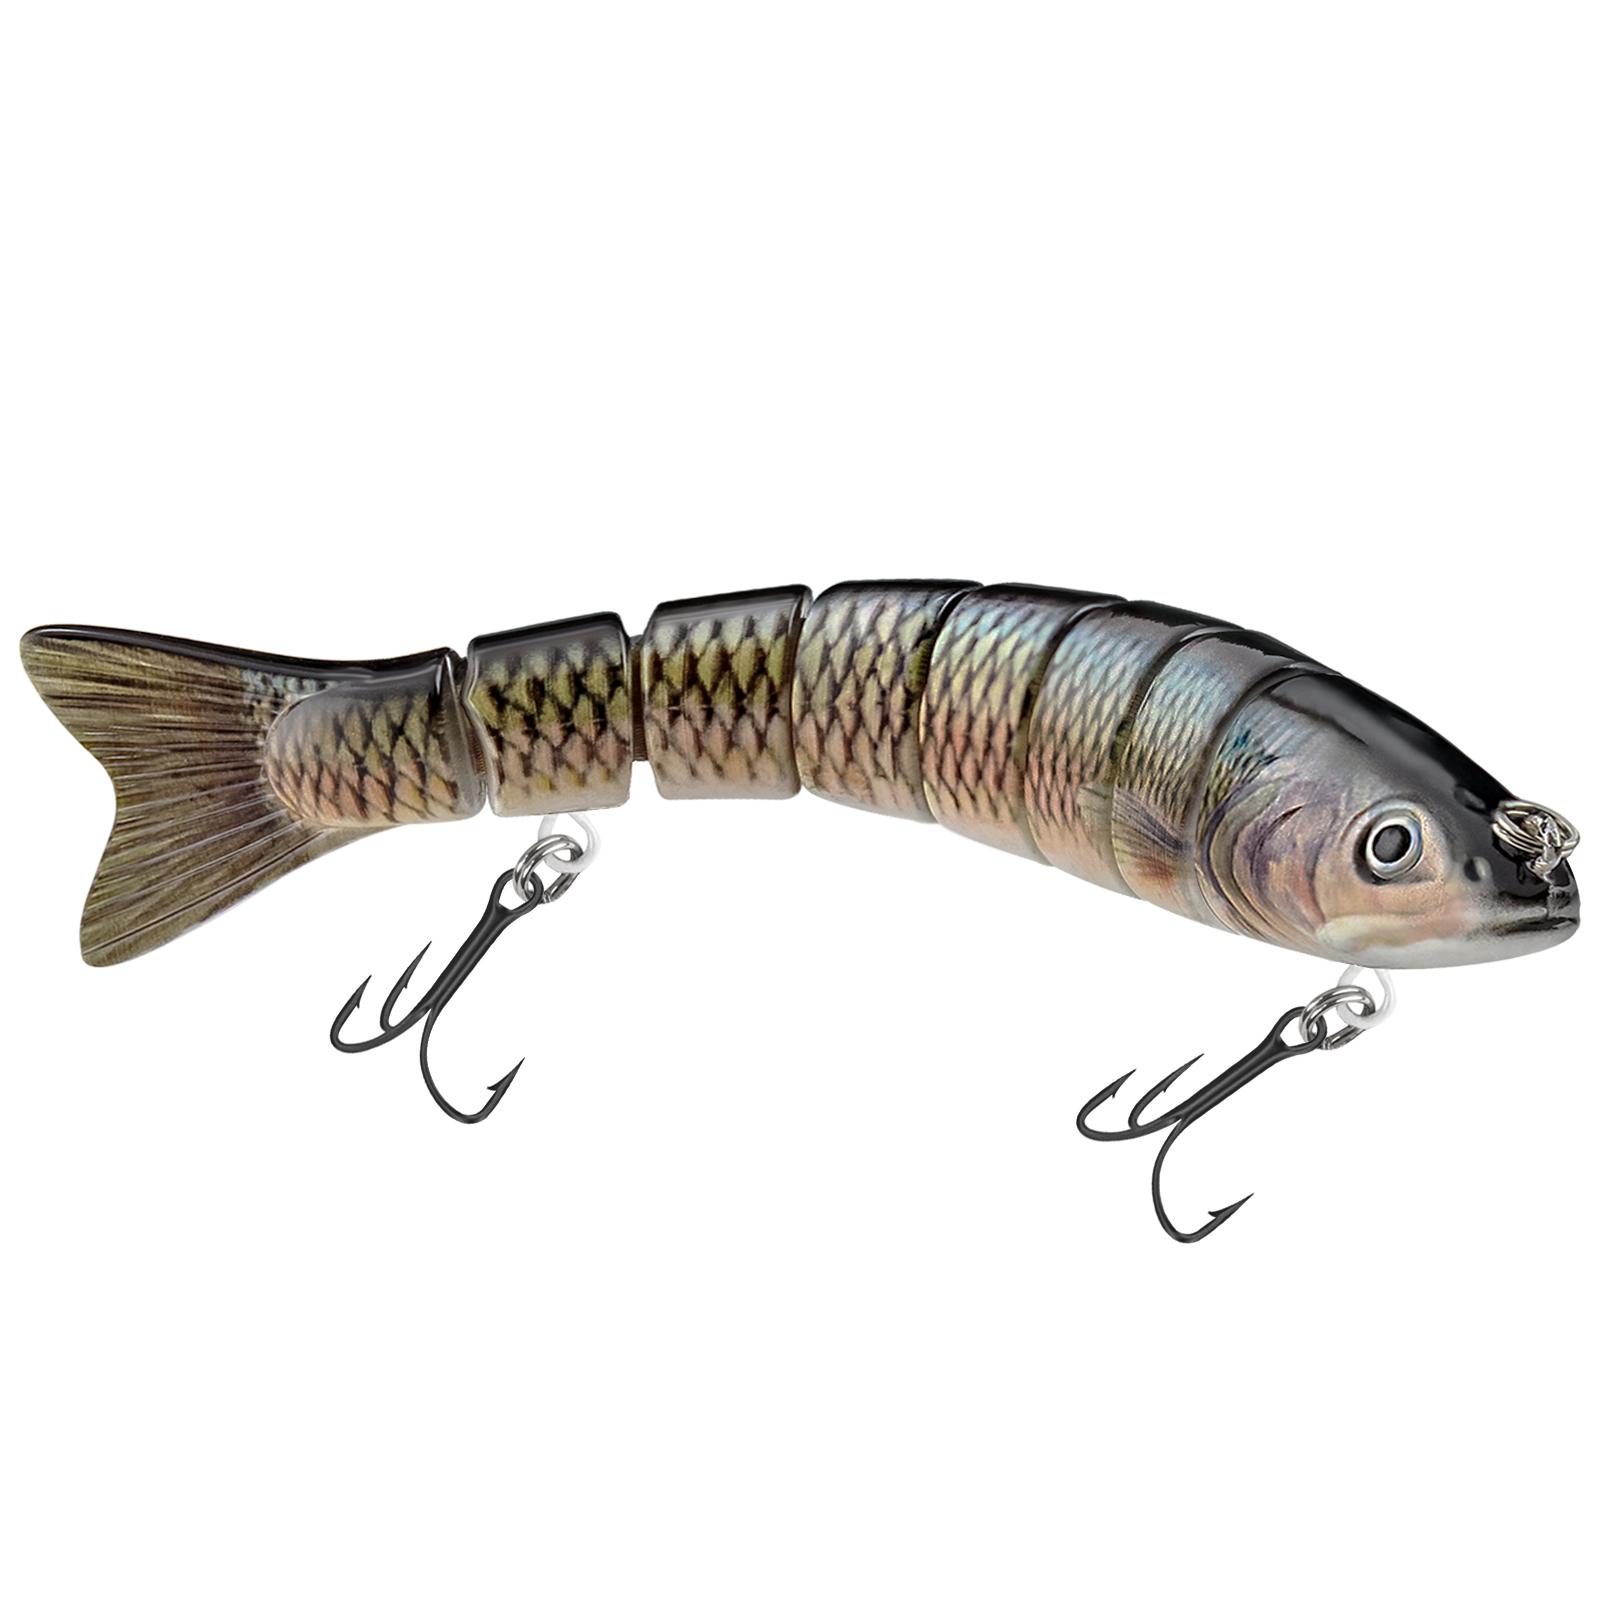 2X Fischköder Löffel Köder ideal für Bass Forelle Barsch Hecht drehen Angeln ZP